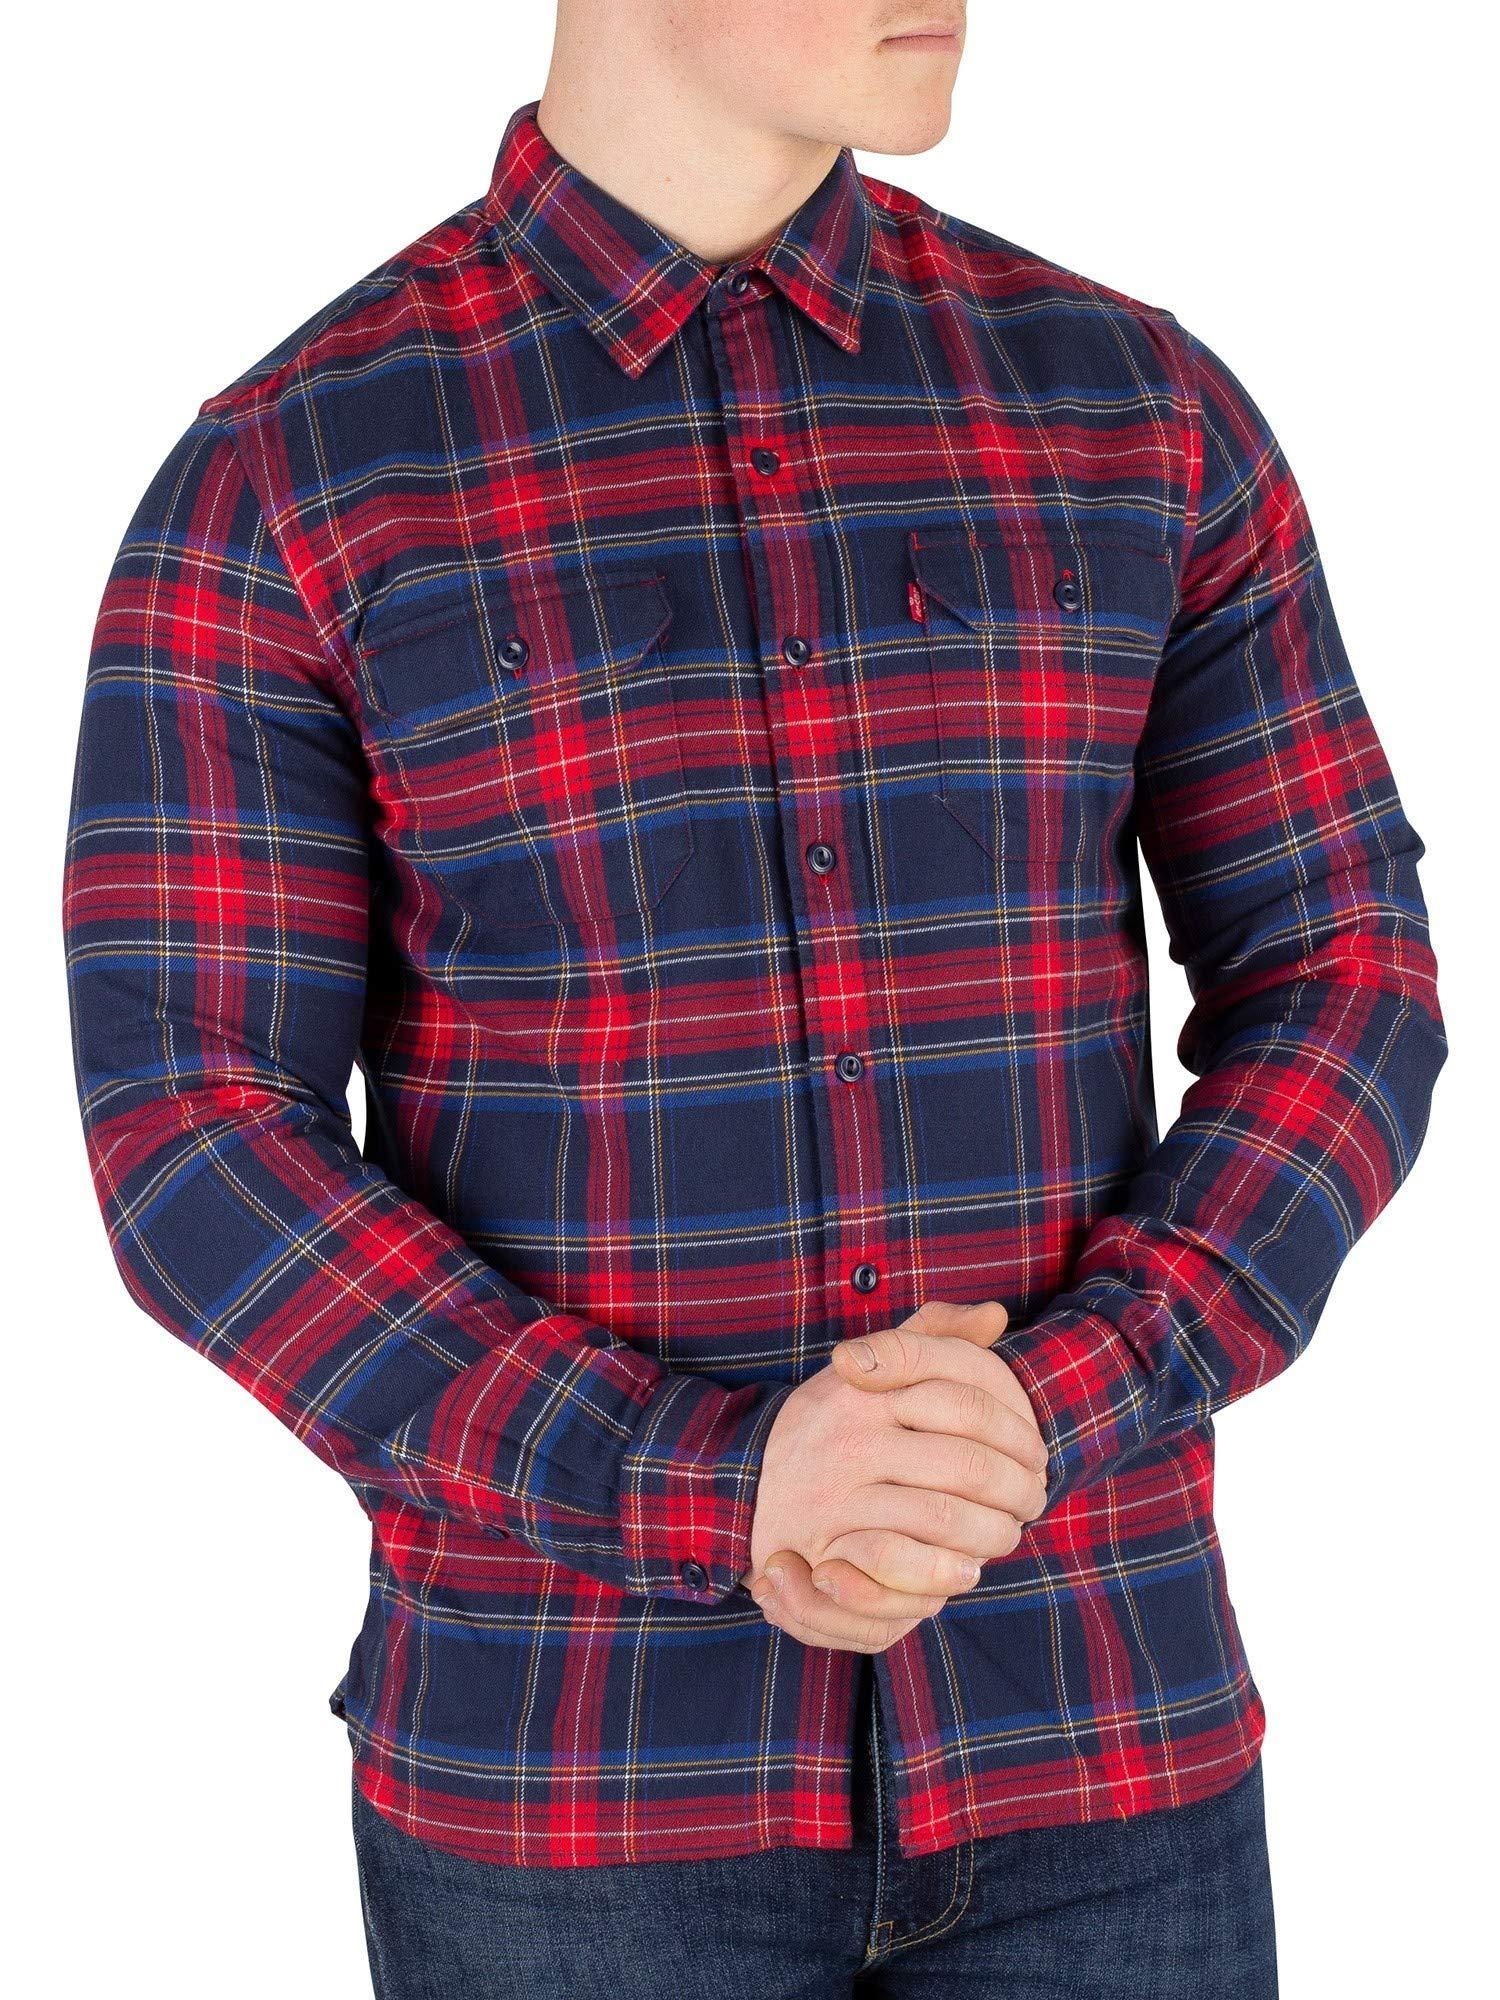 Levi's Hombre Camisa Jackson Worder Lingroth, Azul